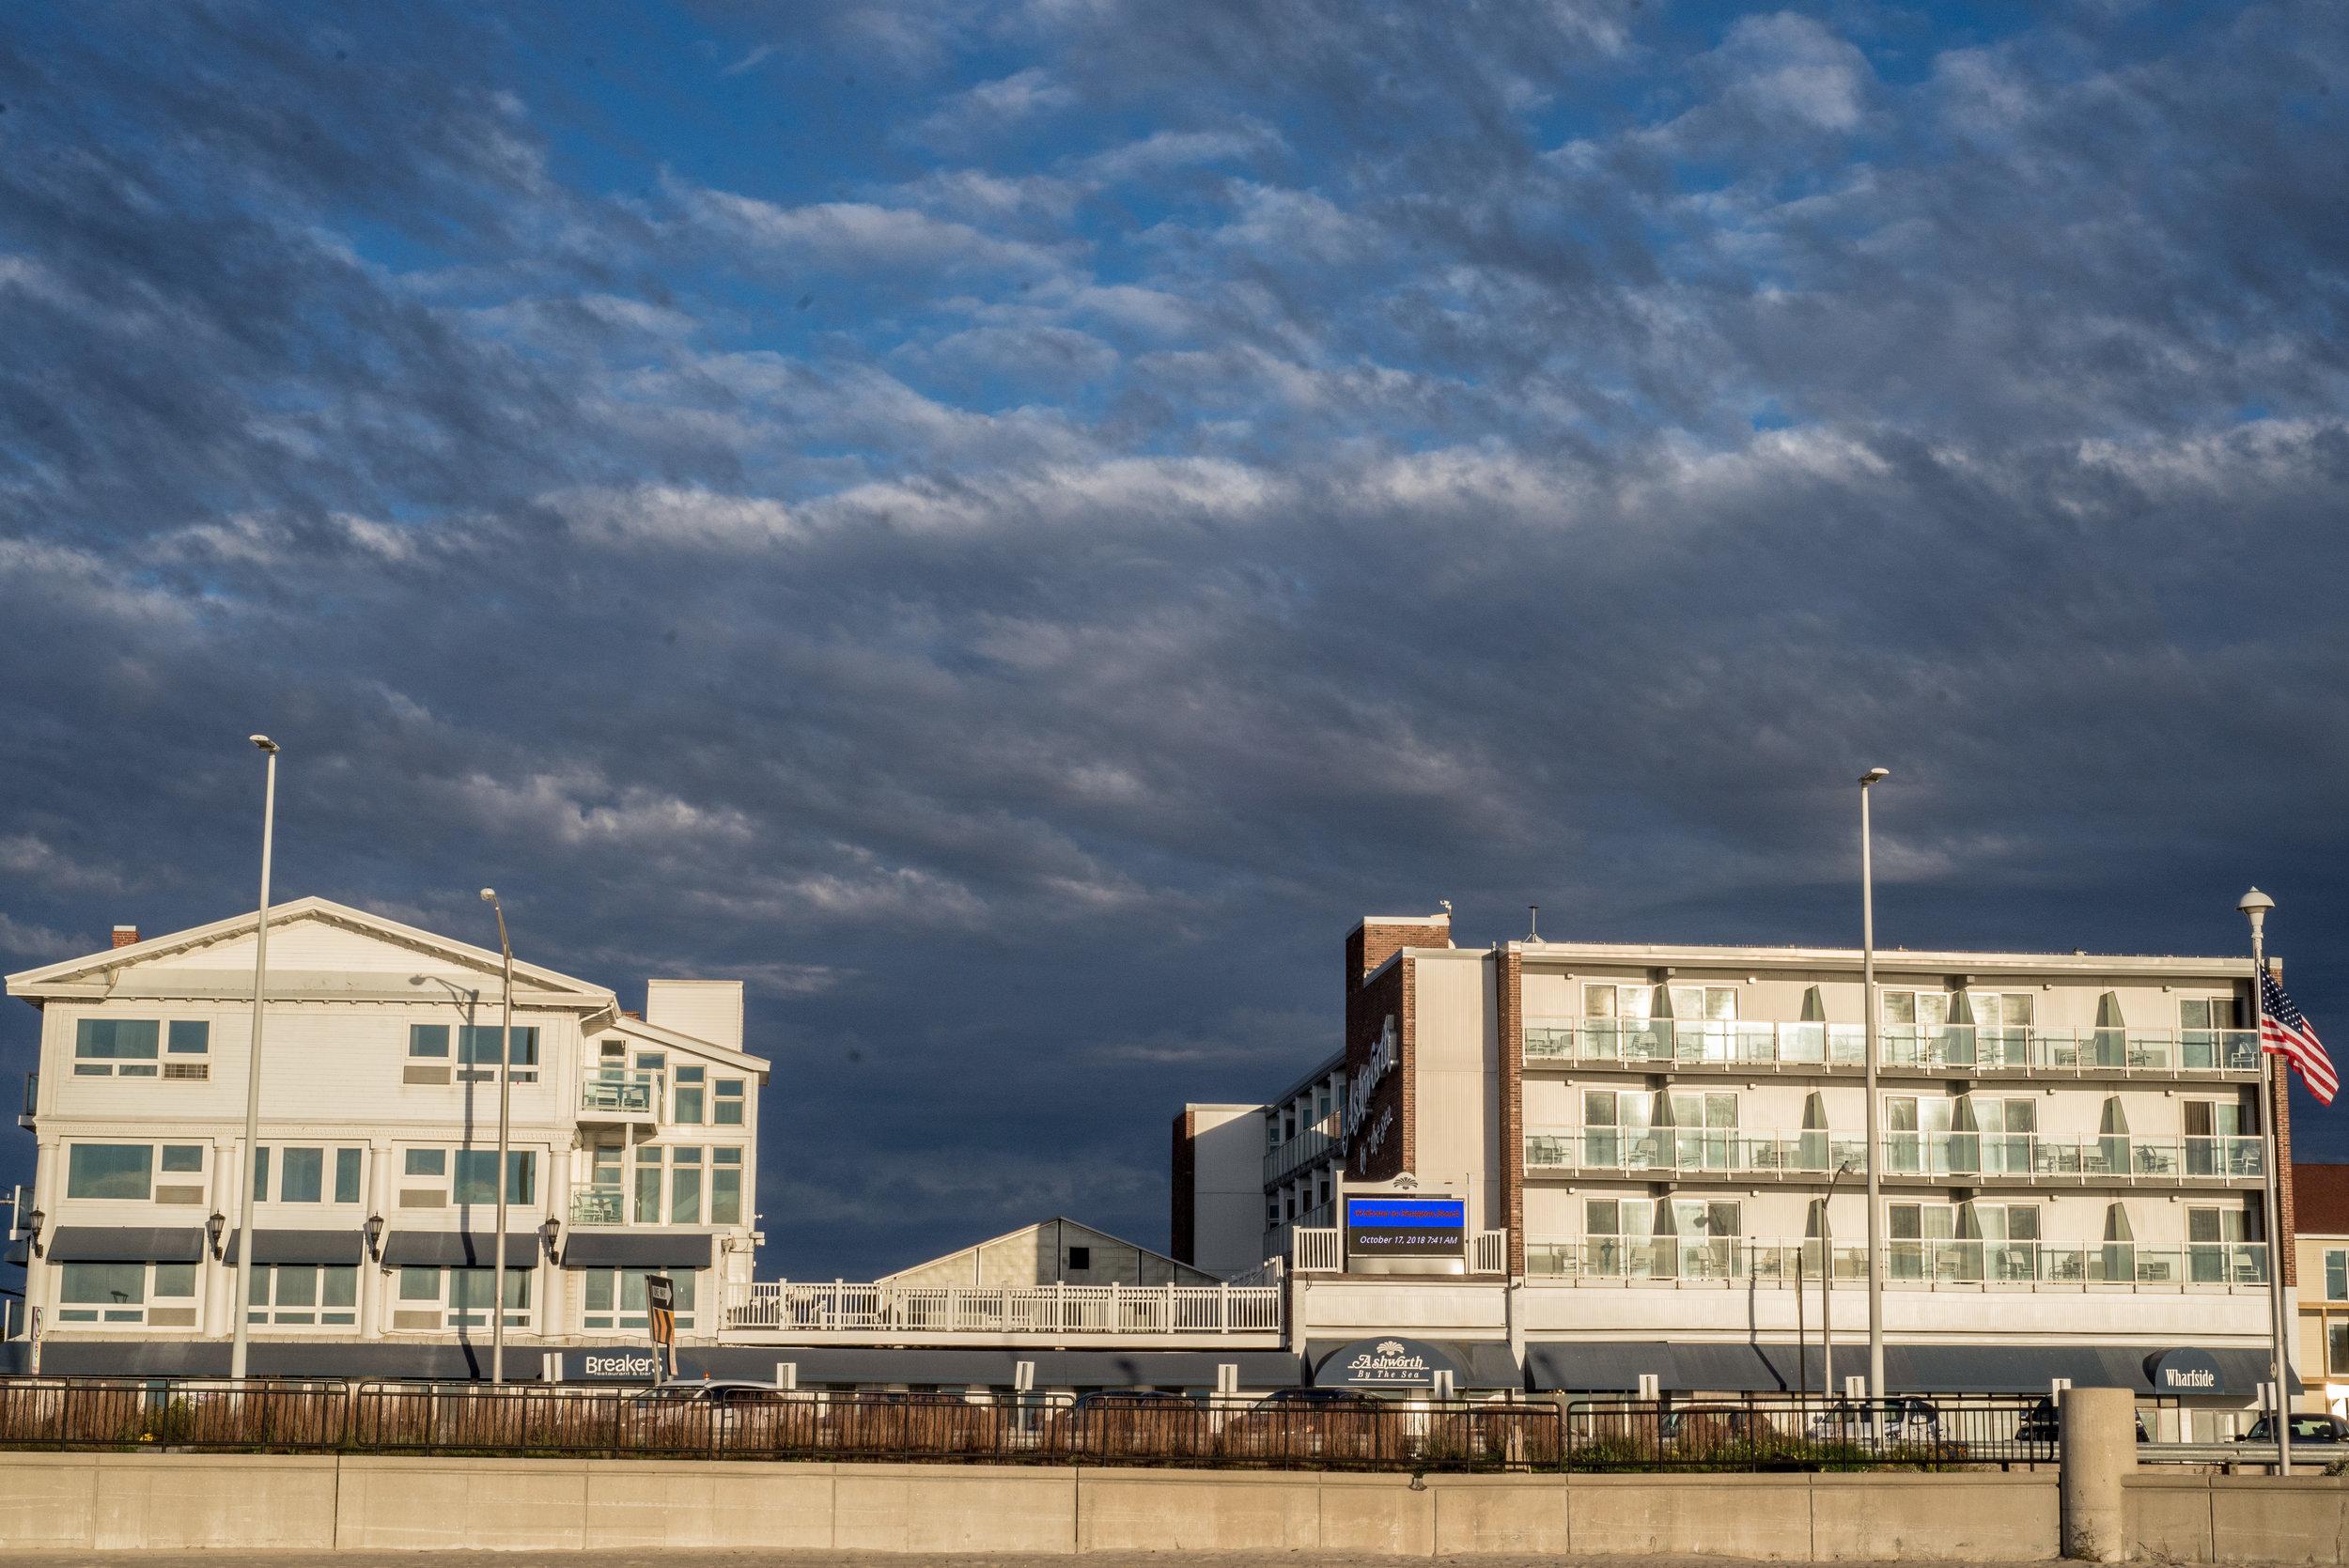 Ashworth Hotel - Ashworth by the Sea - Hampton Beach, New Hampshire by Caitlyn Lunsford Photography